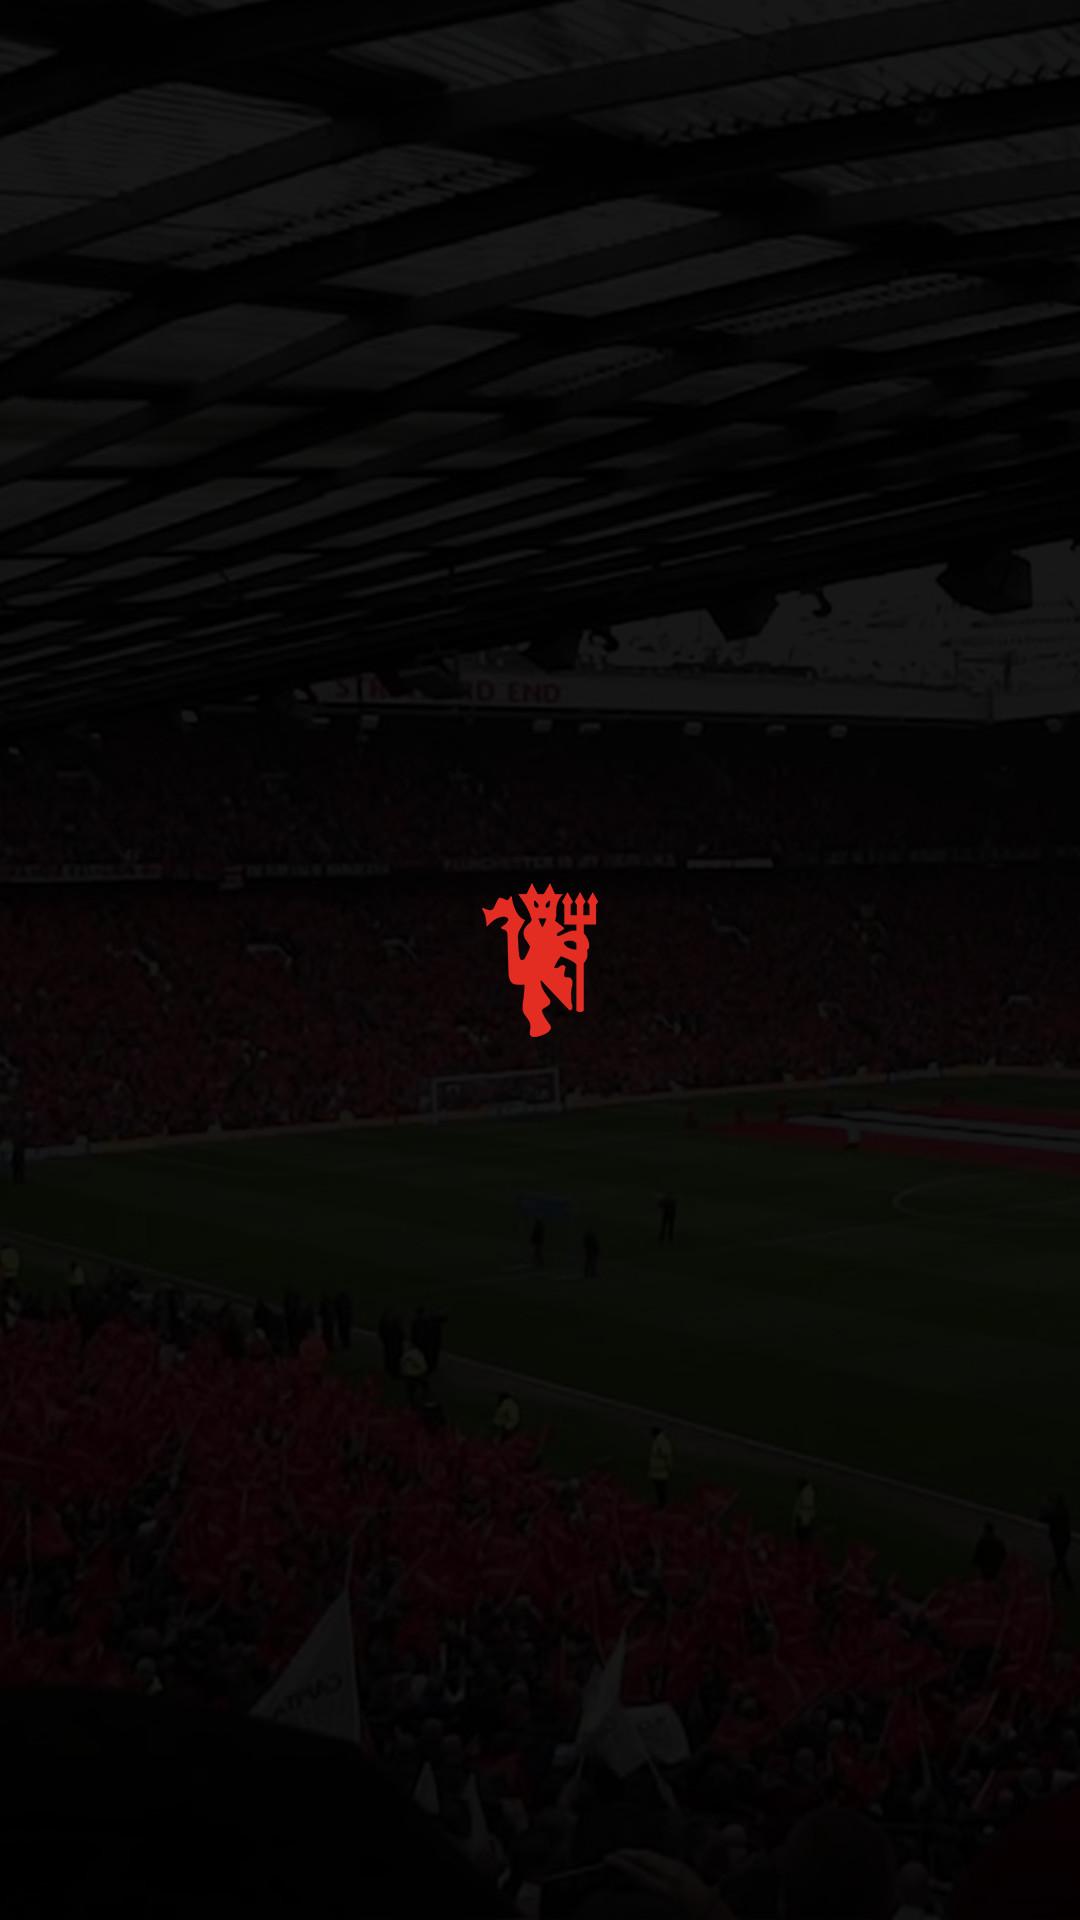 Man Utd Iphone Wallpaper – HD Football Wallpaper